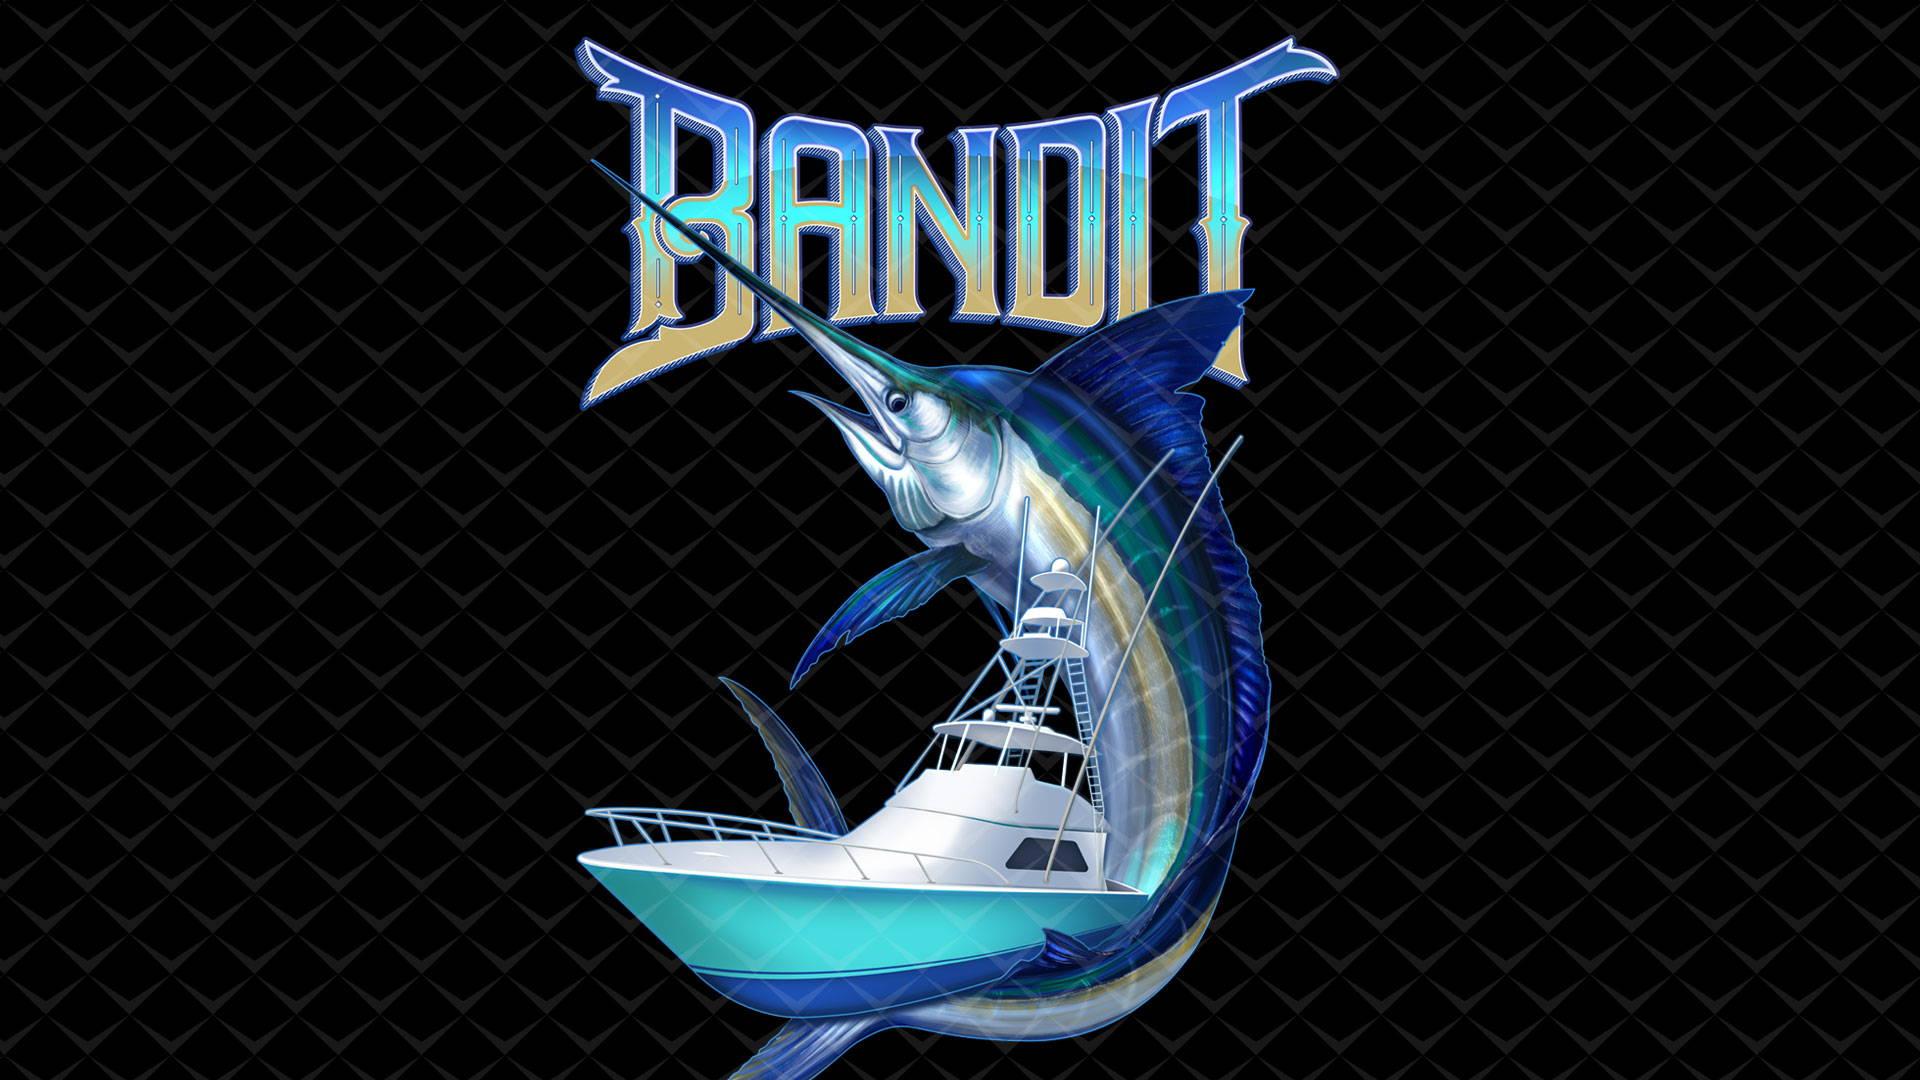 briny custom boat and fish graphic